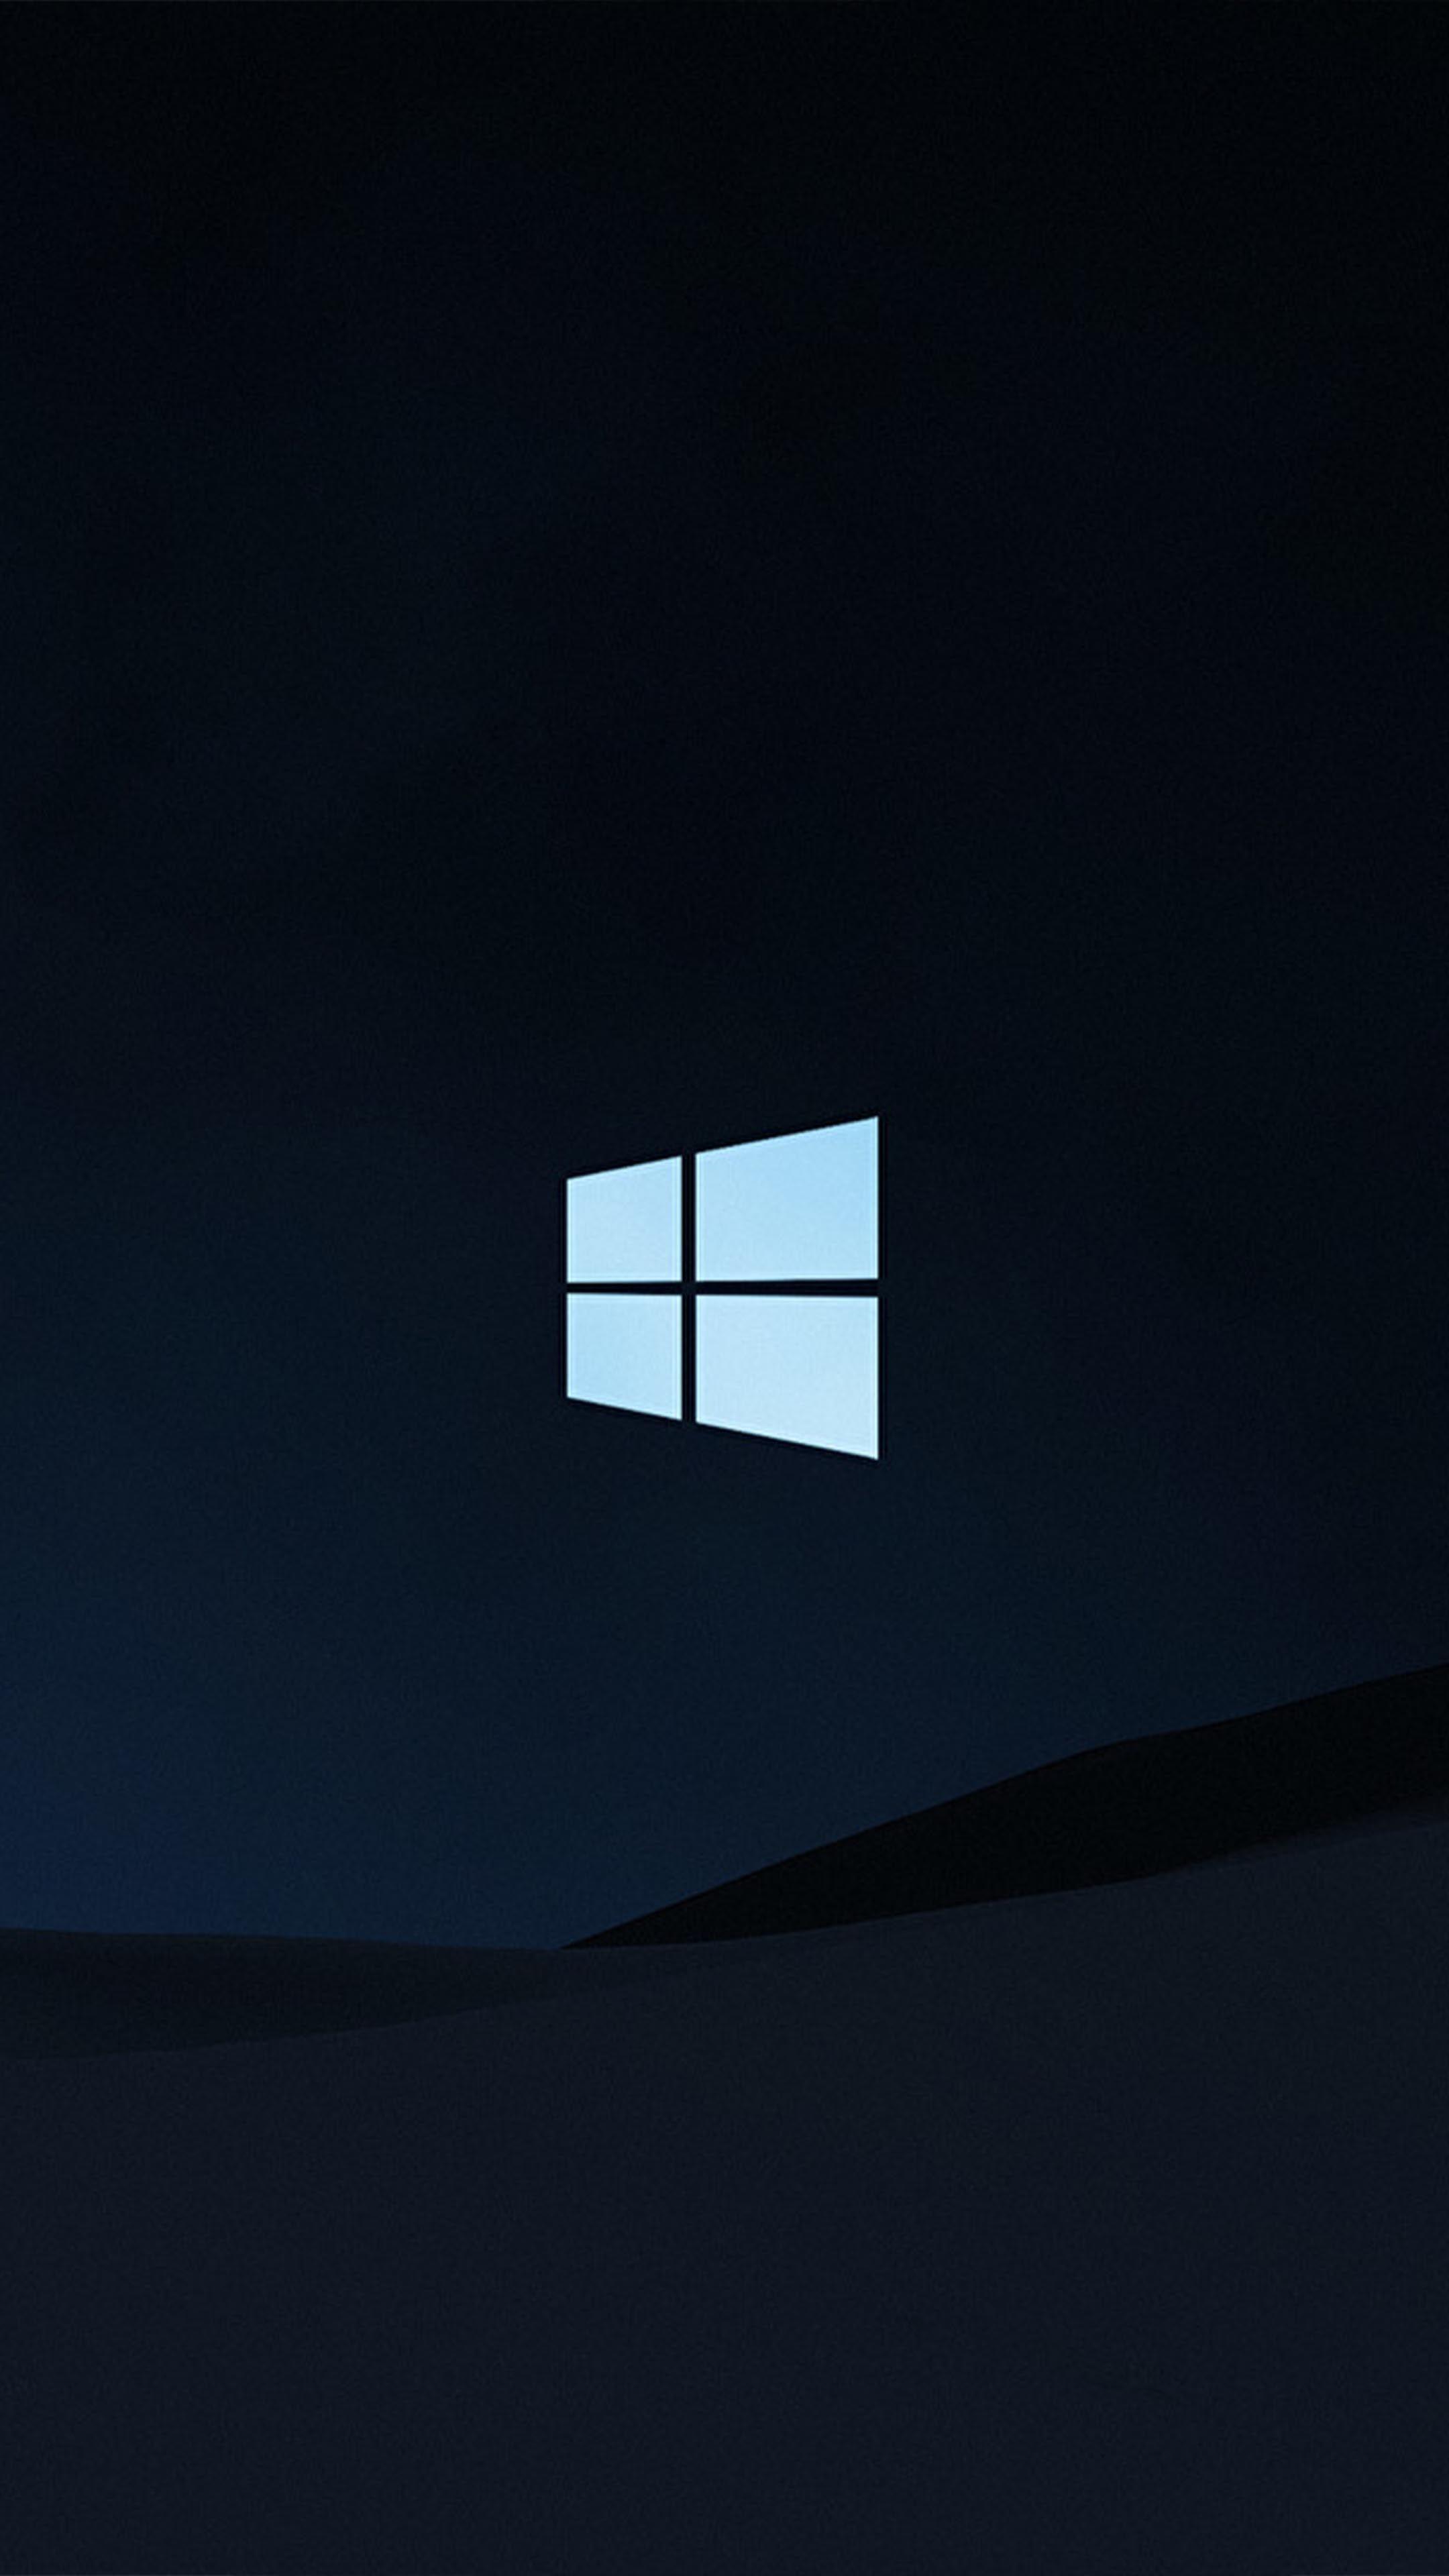 Windows 10 Logo Dark Background 4k Ultra Hd Mobile Wallpaper Windows 10 Logo Windows 10 Background Dark Backgrounds